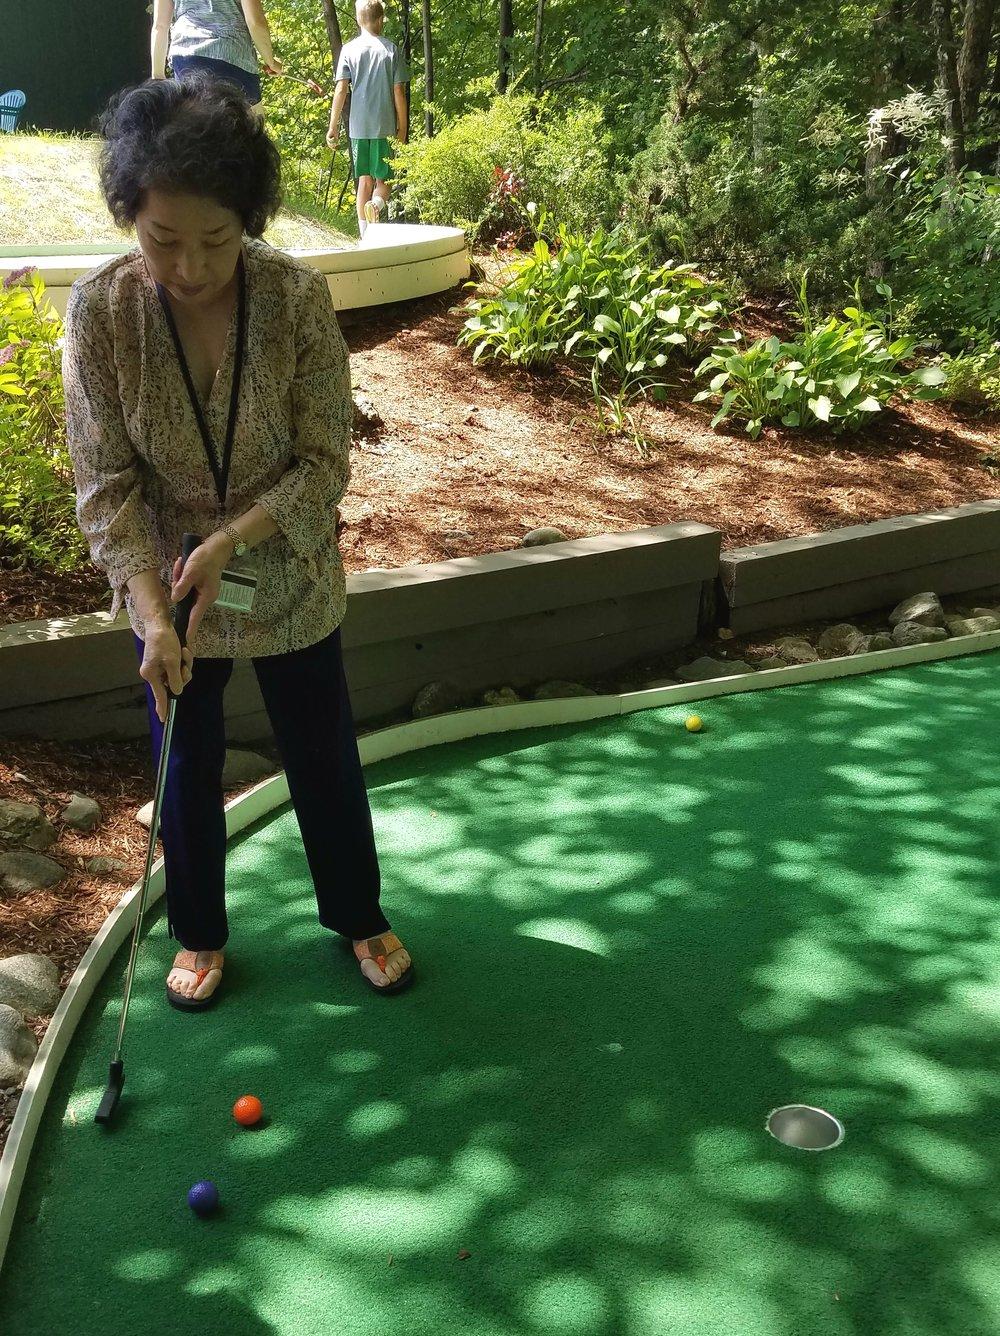 Watching my Mom play mini-golf gave me life